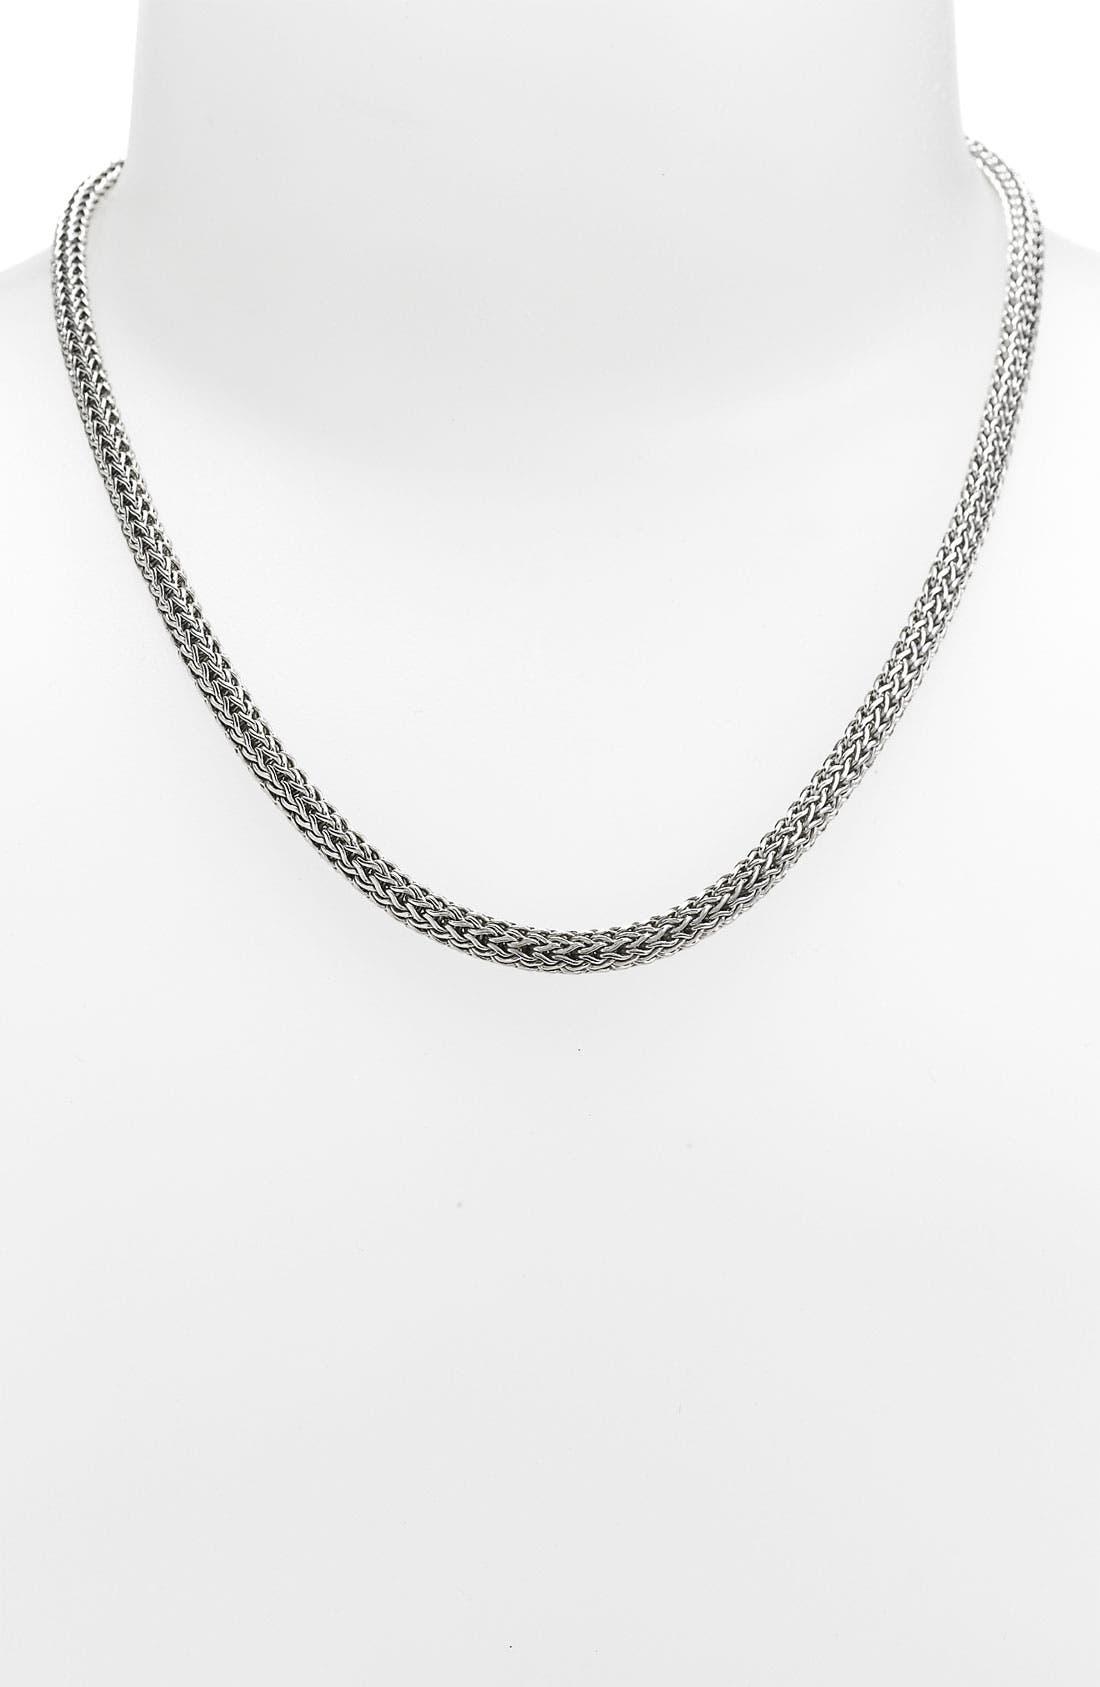 Alternate Image 1 Selected - John Hardy Pavé Diamond Clasp Small Chain Necklace